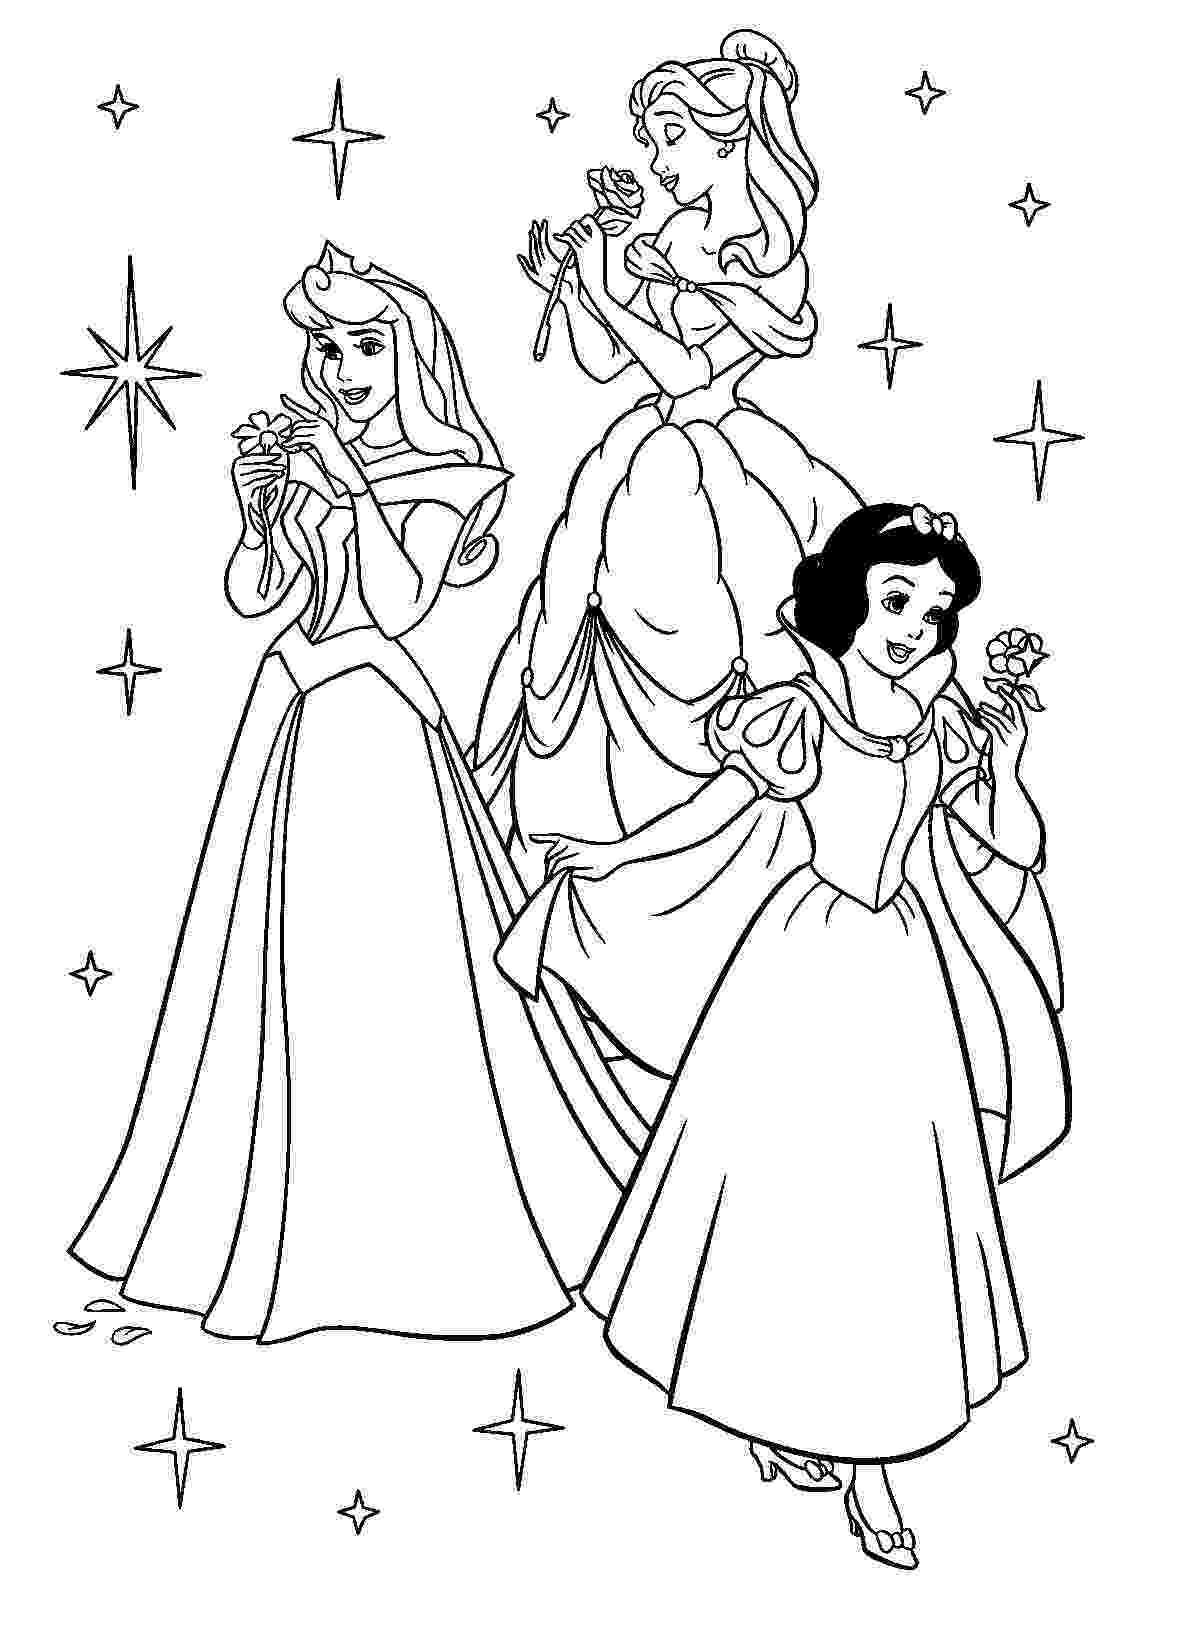 coloring pages online princess disney princess coloring pages minister coloring pages coloring online princess